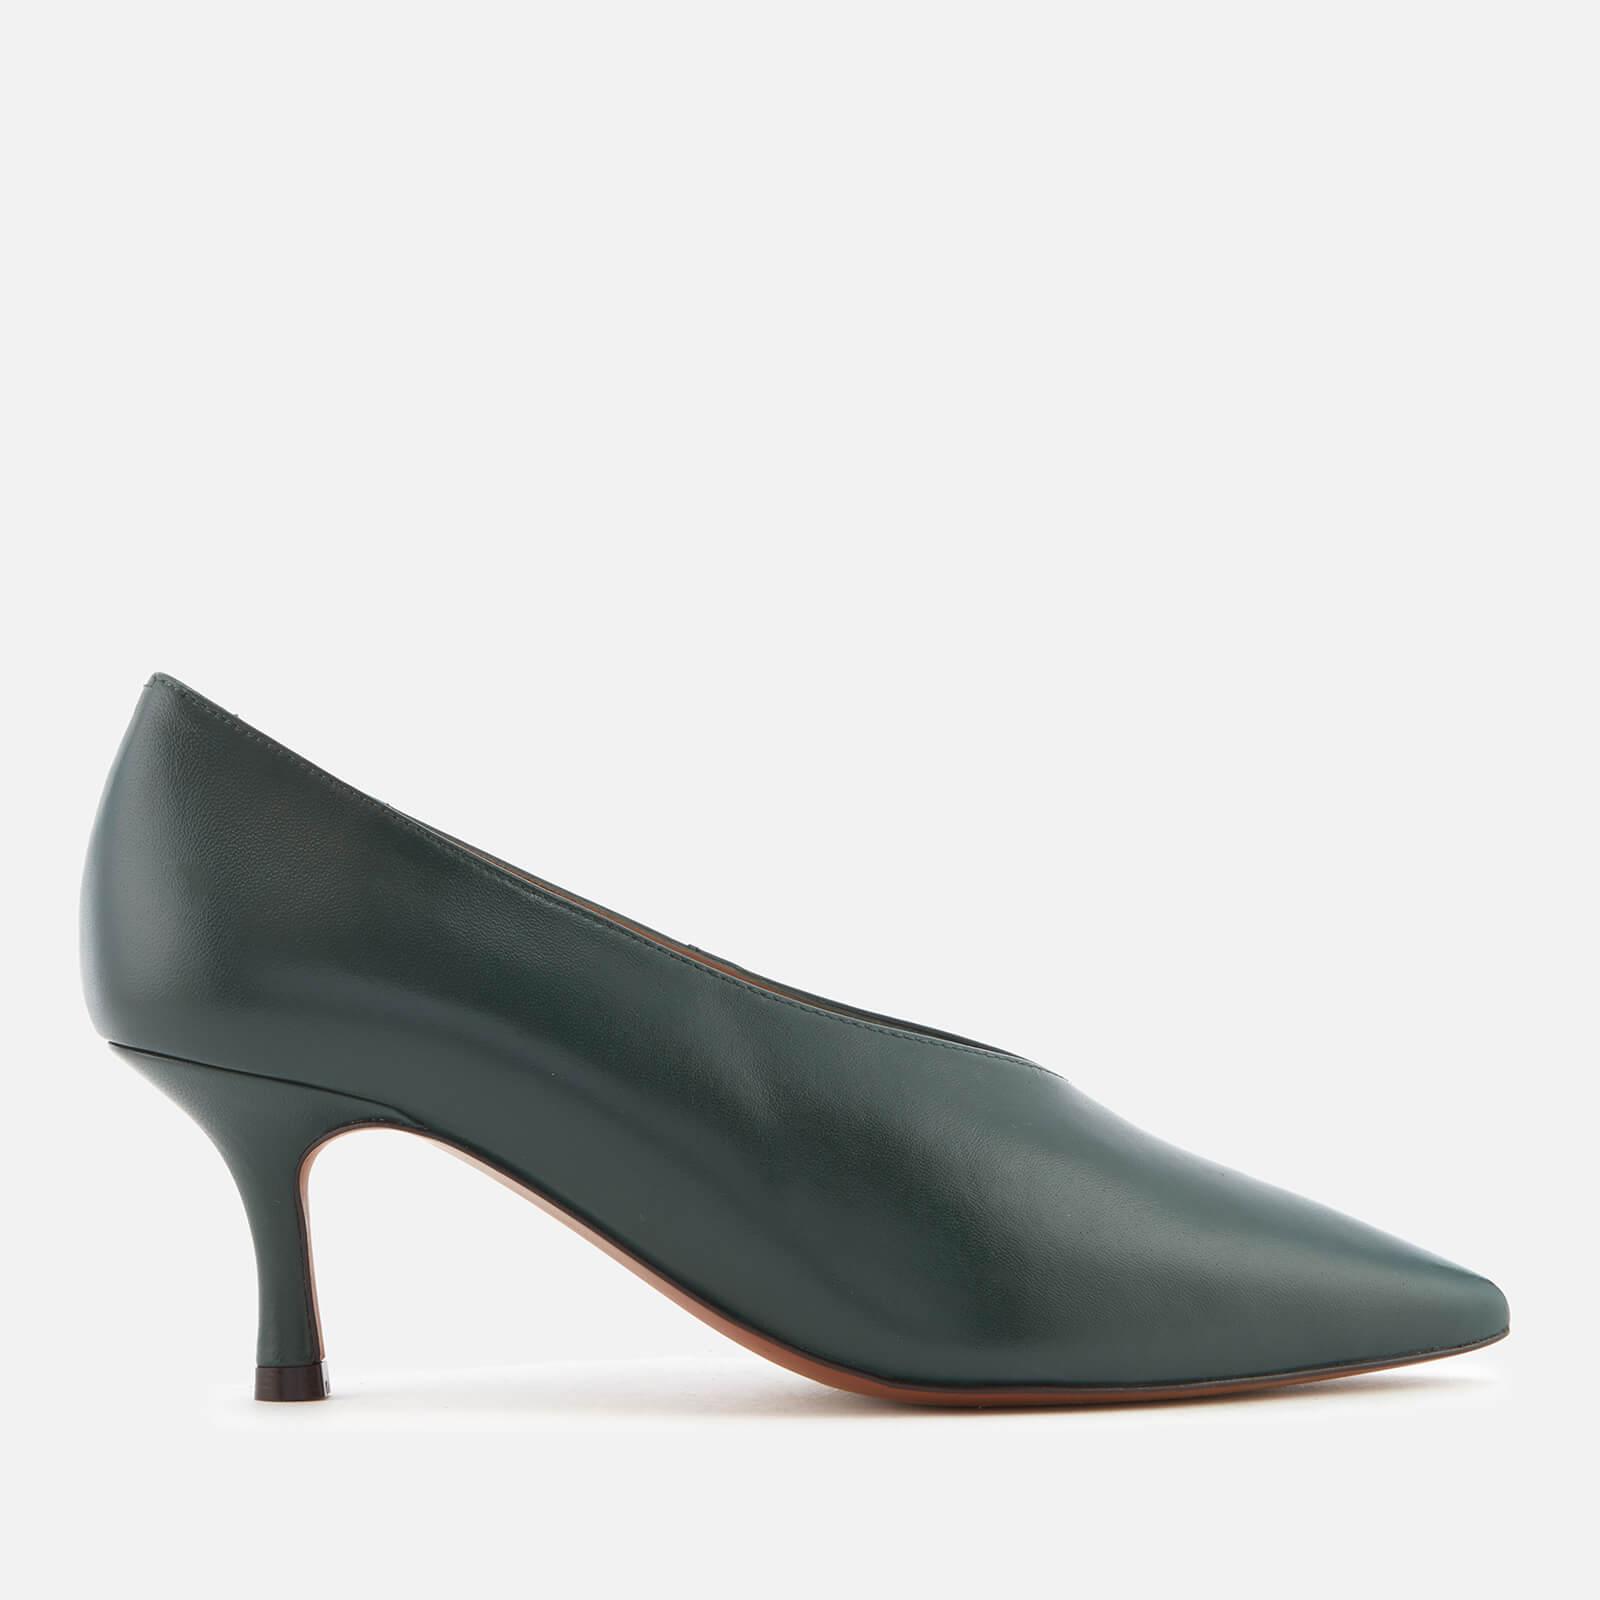 58195e60f1 Whistles Women's Zurie Kitten Heel Court Shoes - Green Clothing   TheHut.com